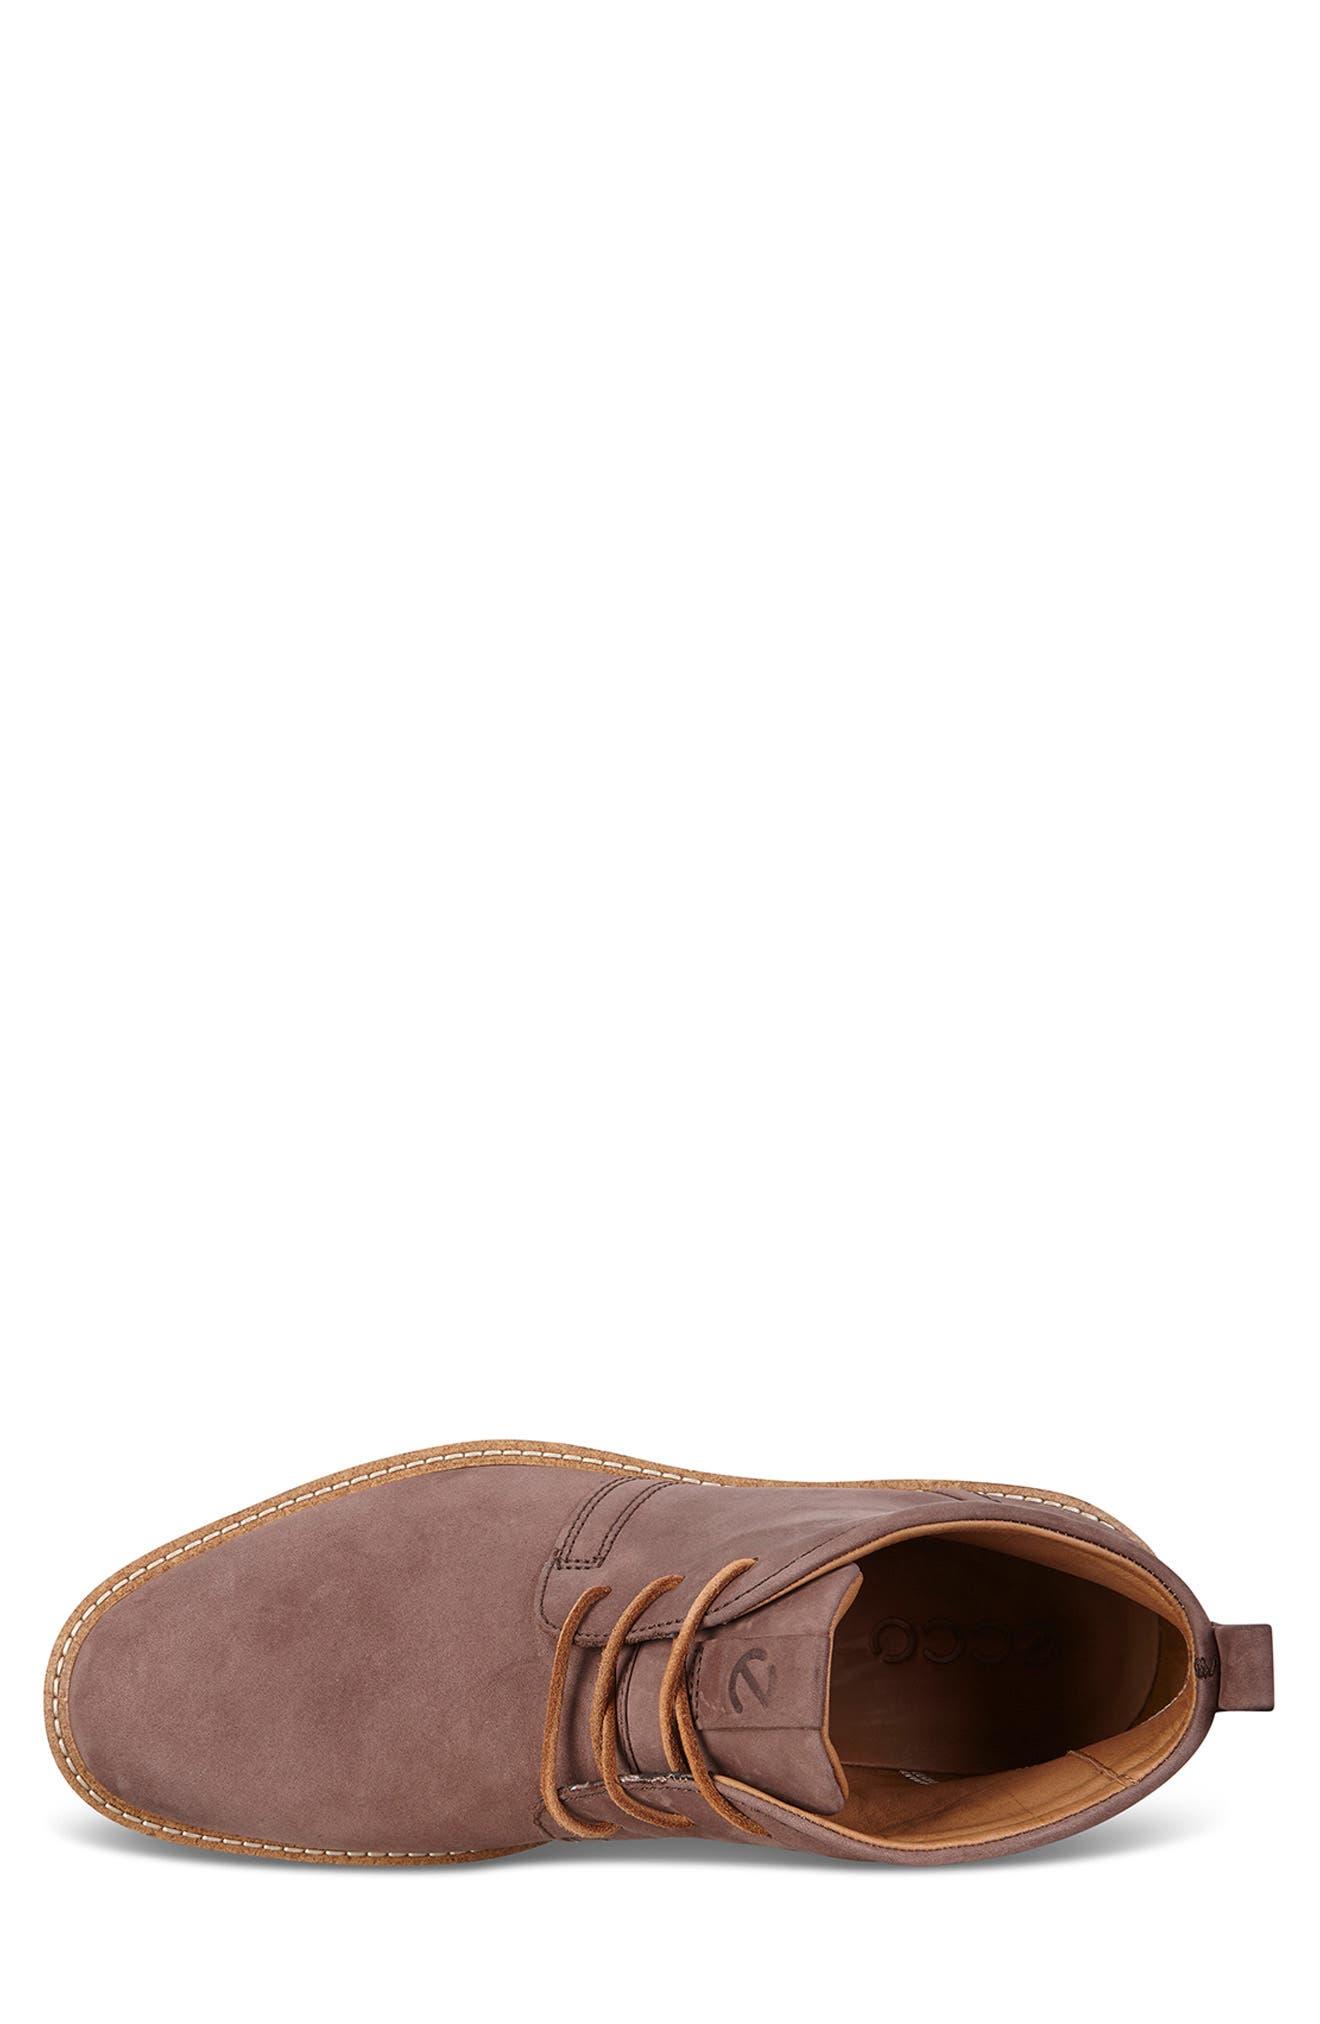 'Jeremy Hybrid' Plain Toe Boot,                             Alternate thumbnail 4, color,                             COFFEE LEATHER